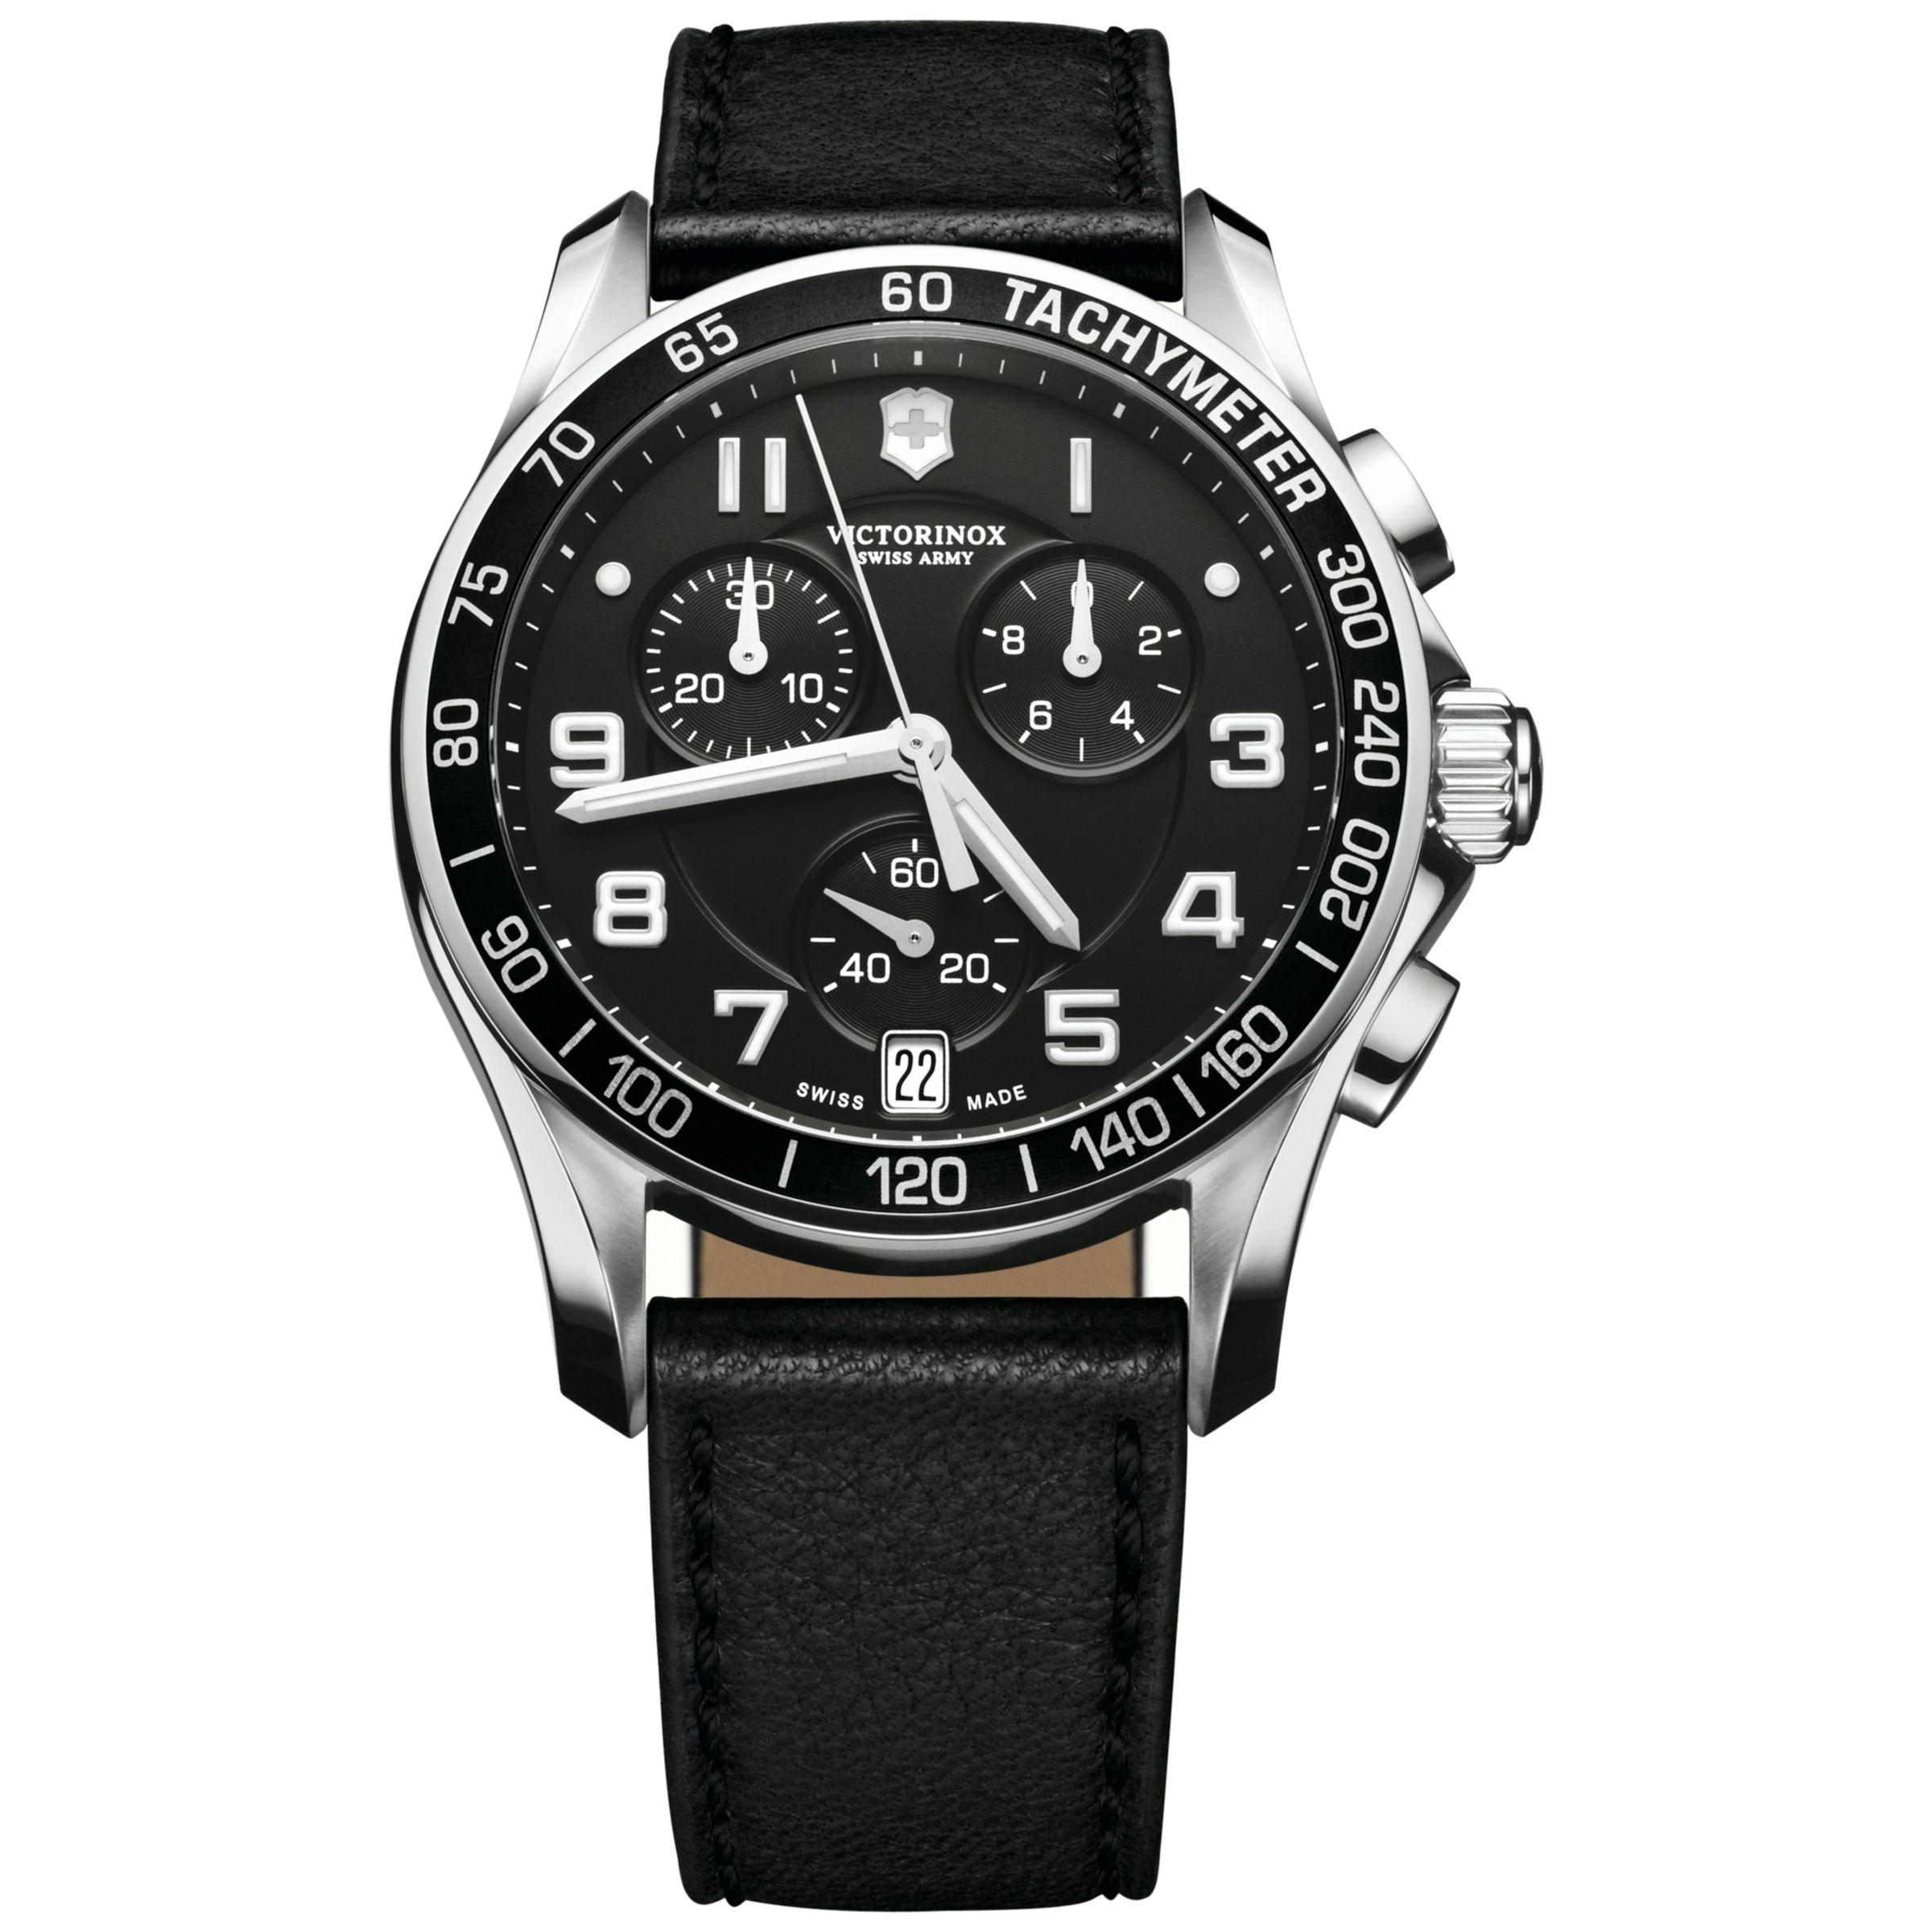 Victorinox Victorinox 241493 Men's Infantry Chronograph Leather Strap Watch, Black